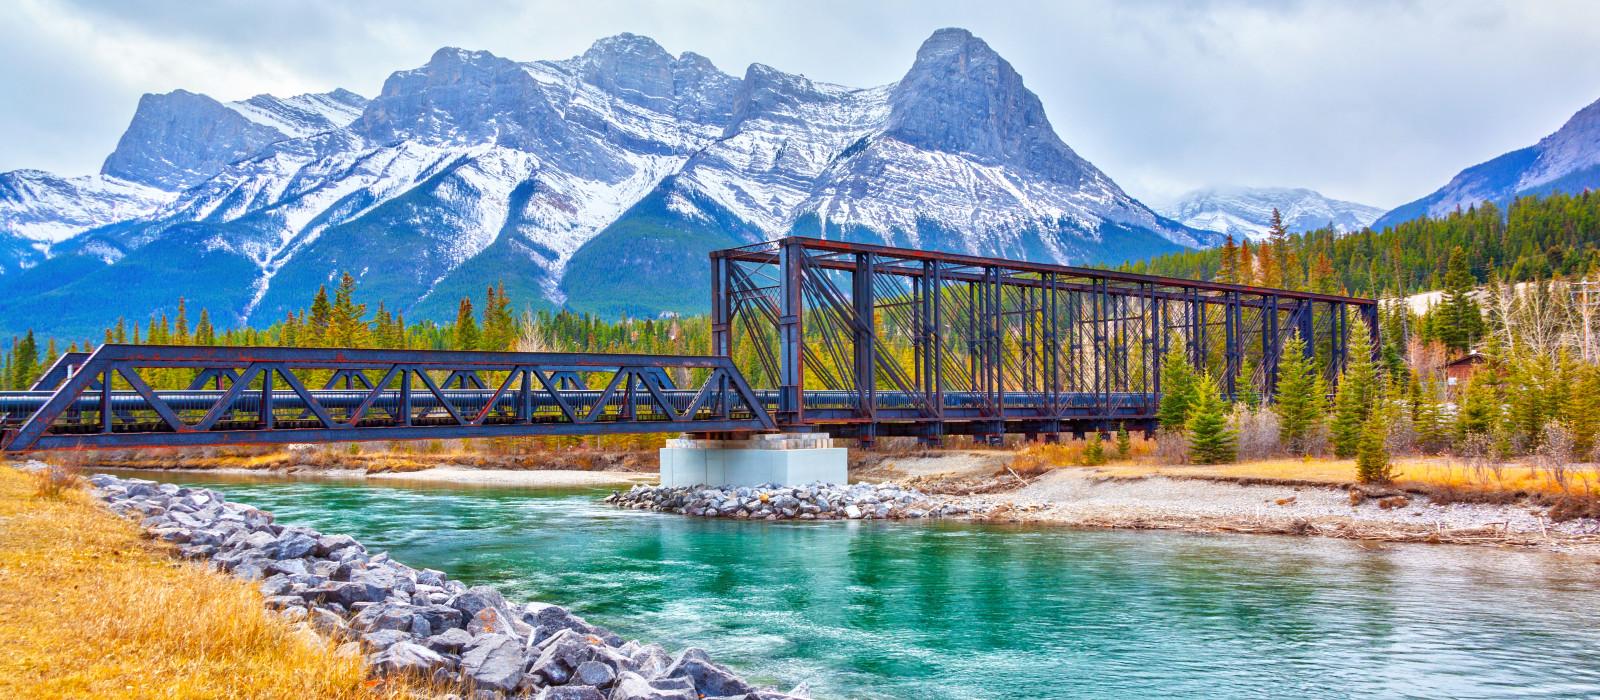 Destination Canmore Canada